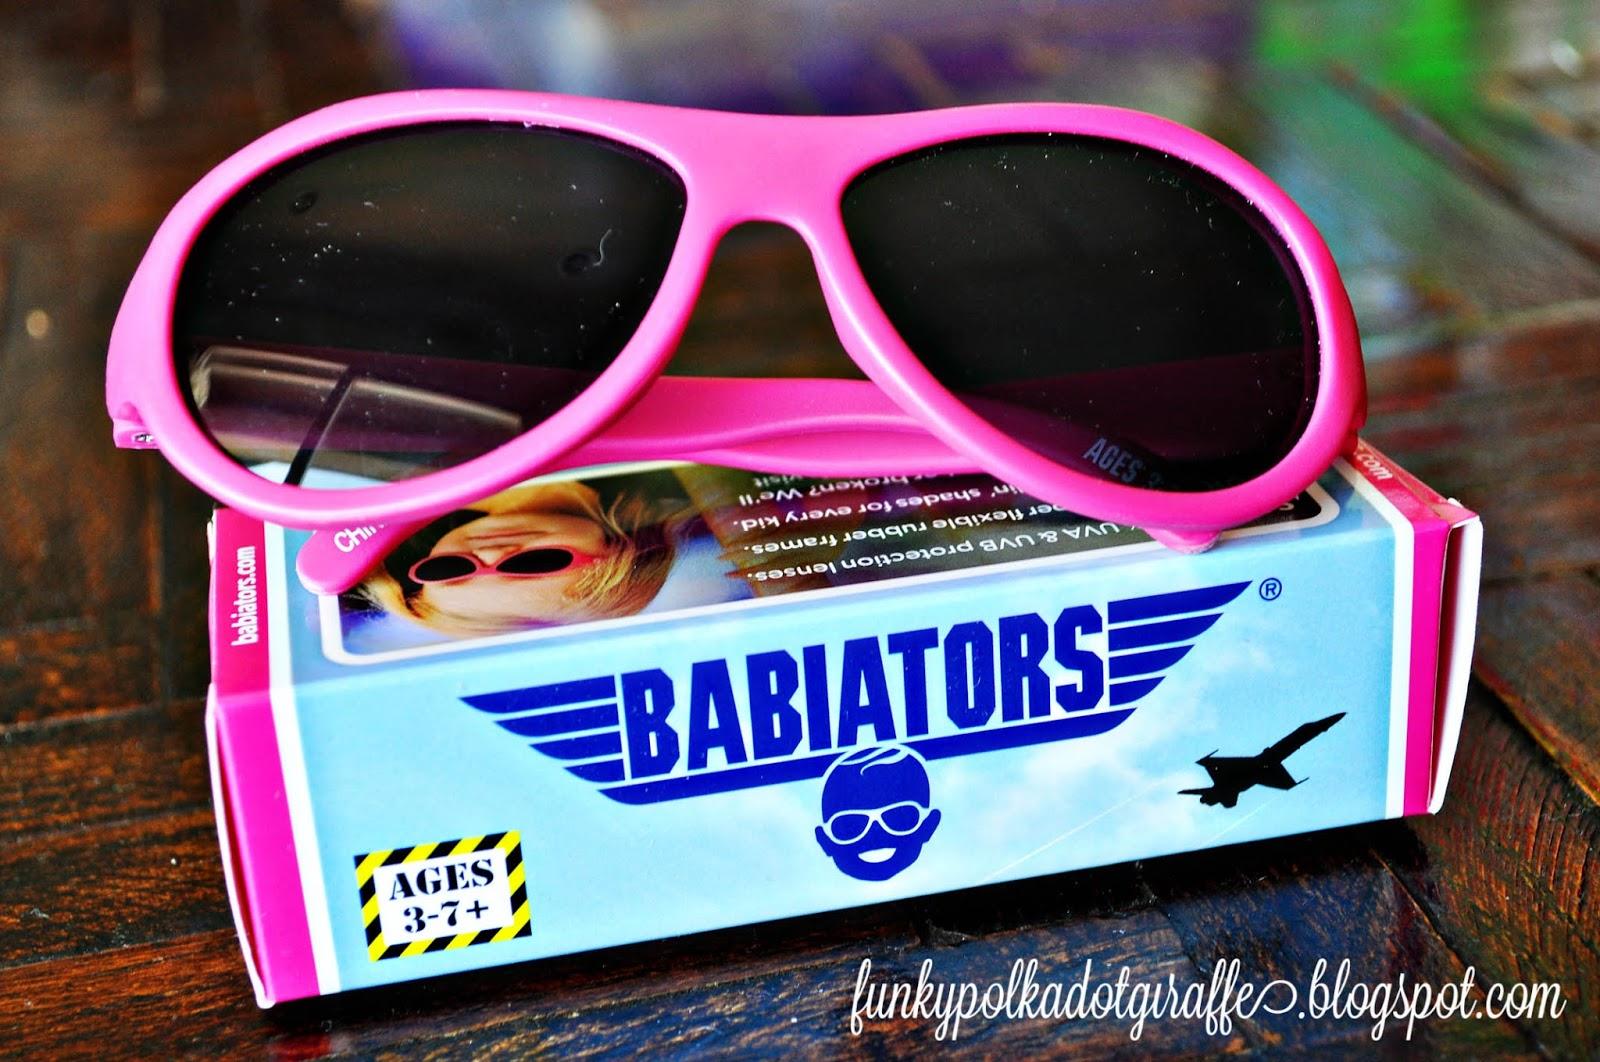 08aeadbd7e4 Funky Polkadot Giraffe  Babiators Sunglasses  GIVEAWAY